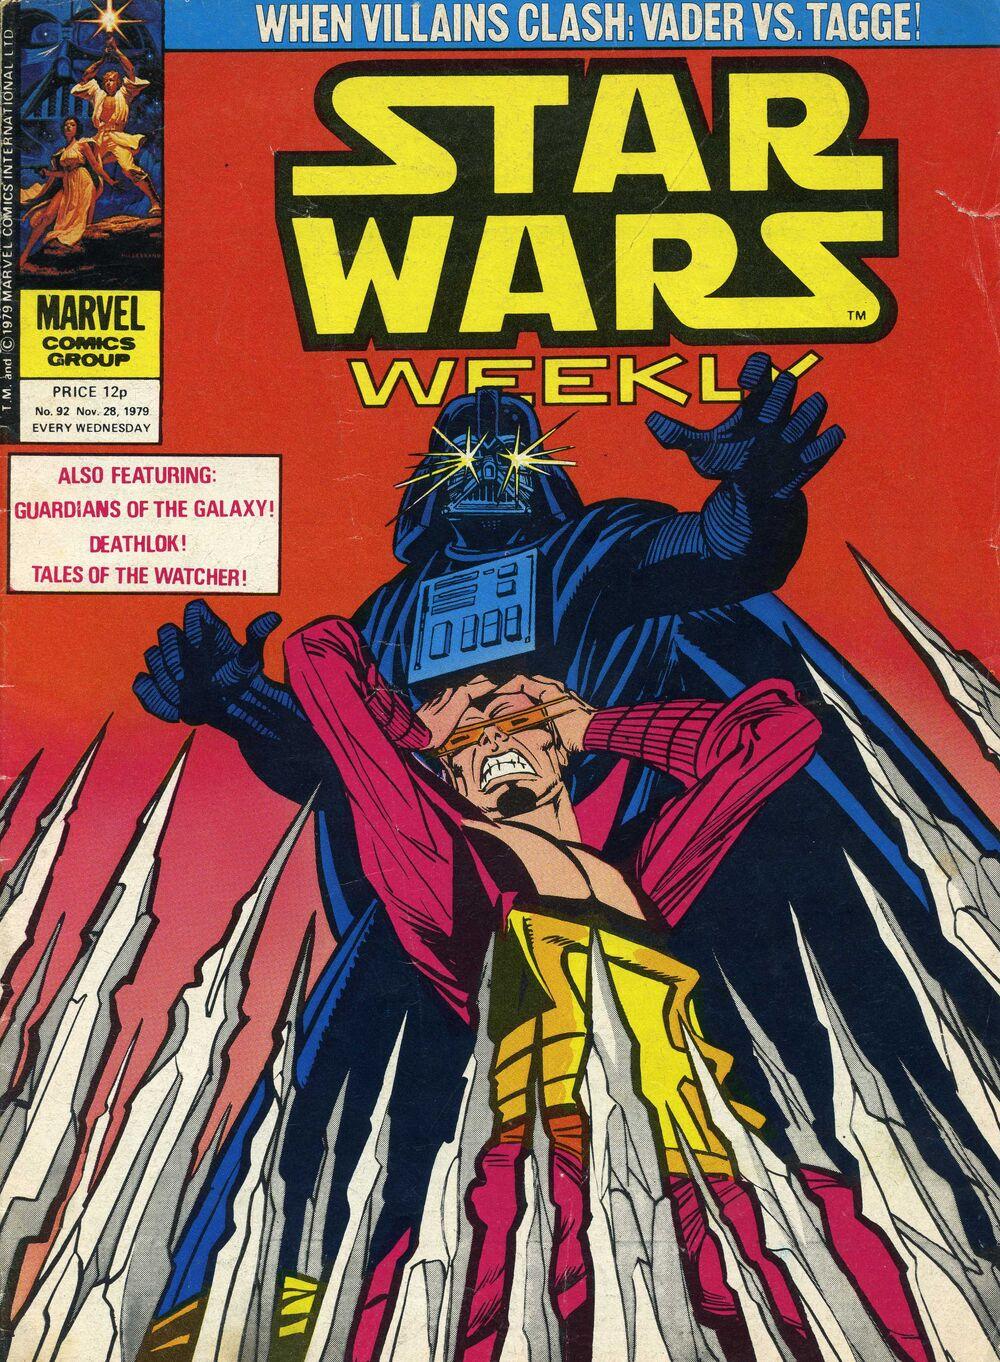 Star Wars Weekly 92